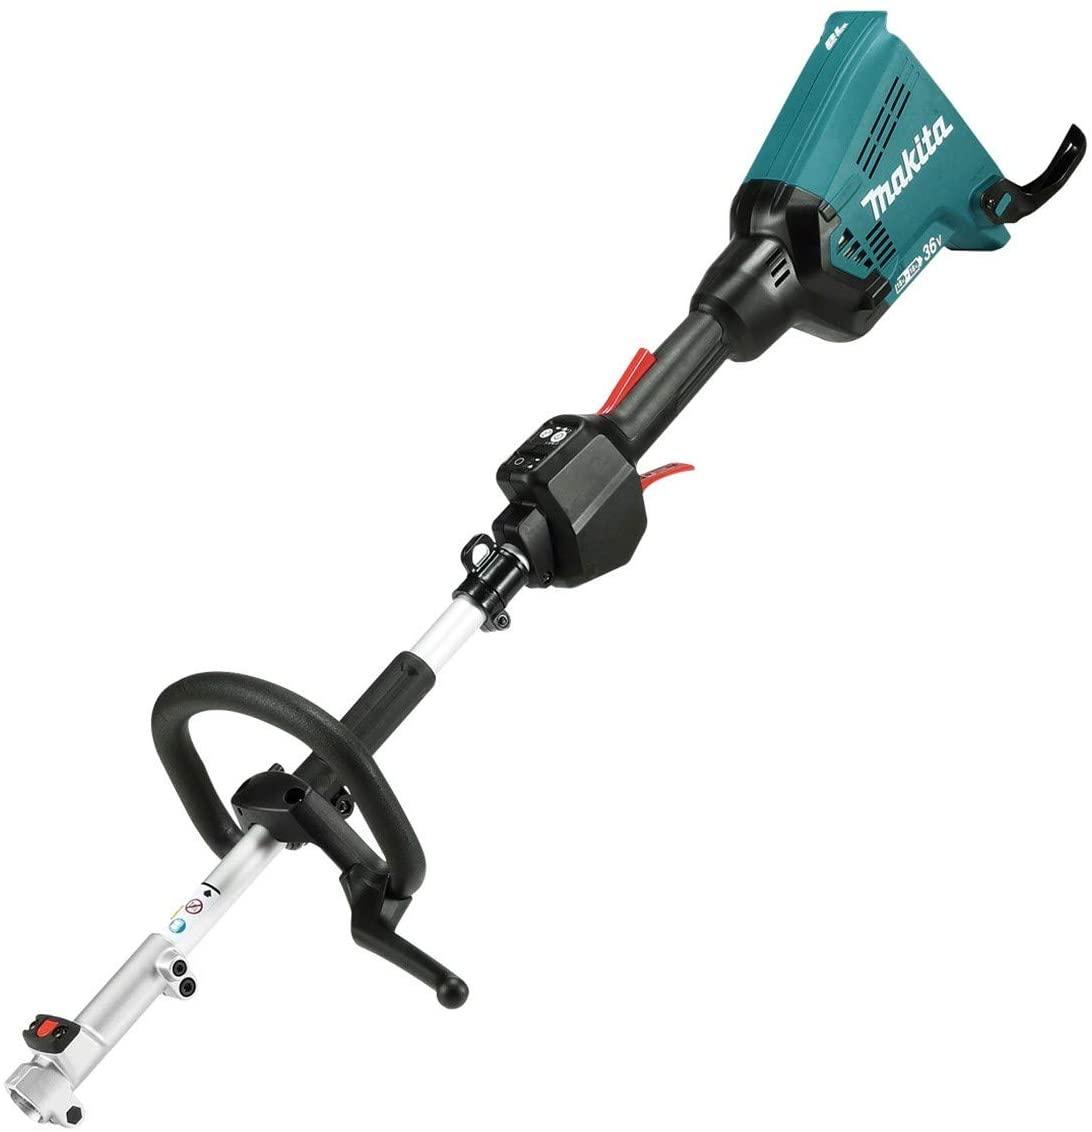 Split shaft Brush Cutter Drive Unit Cordless 18v